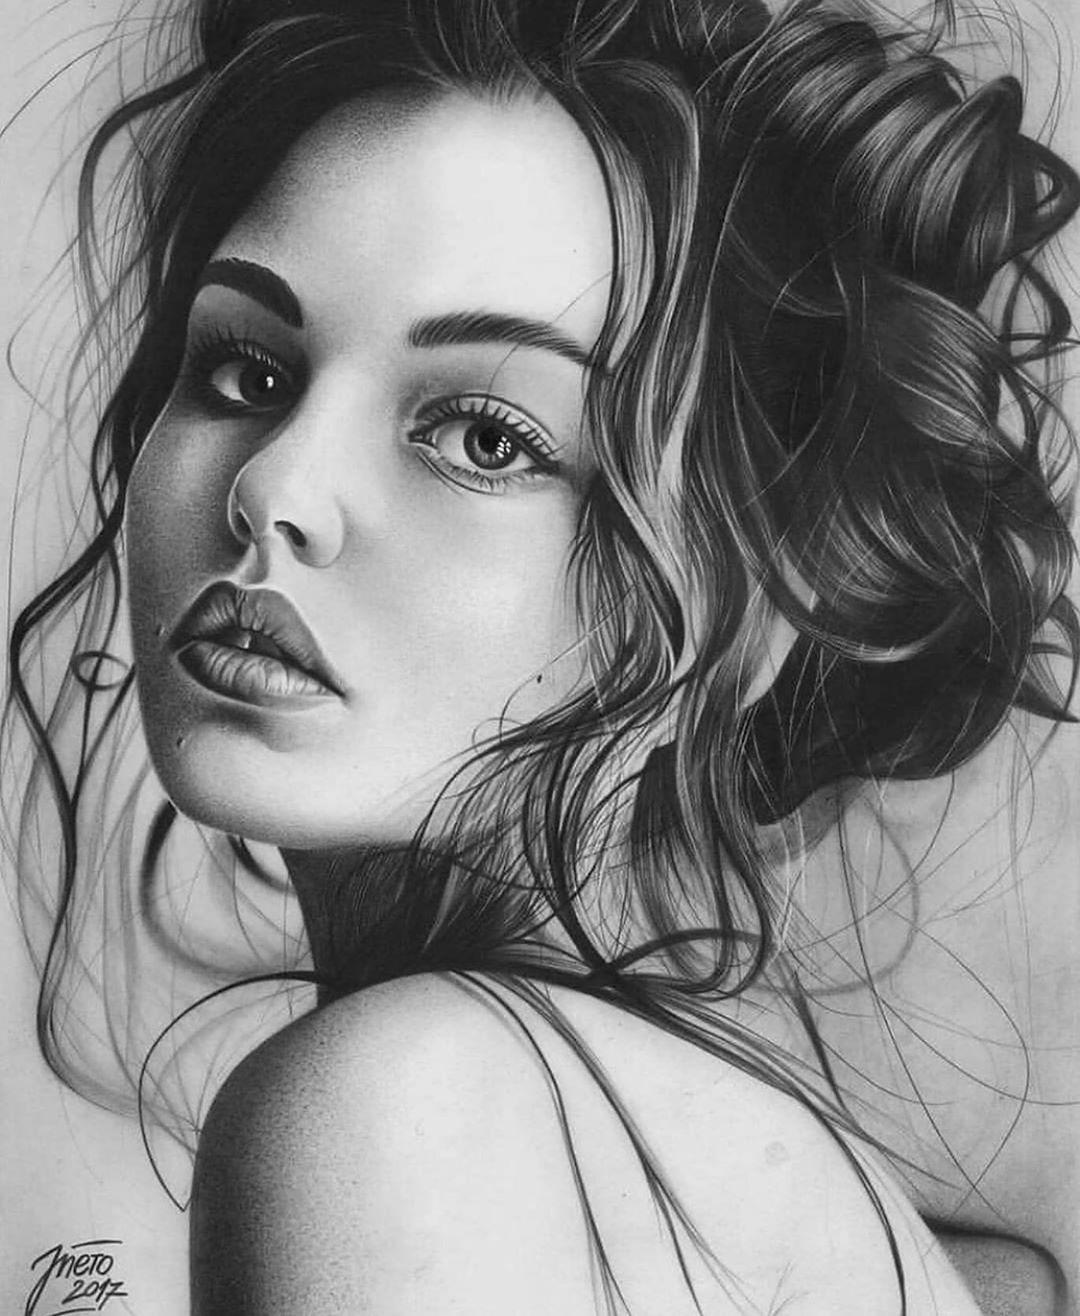 Amazing Drawing Artis Realistic Pencil Drawings Pencil Portrait Pencil Art Drawings